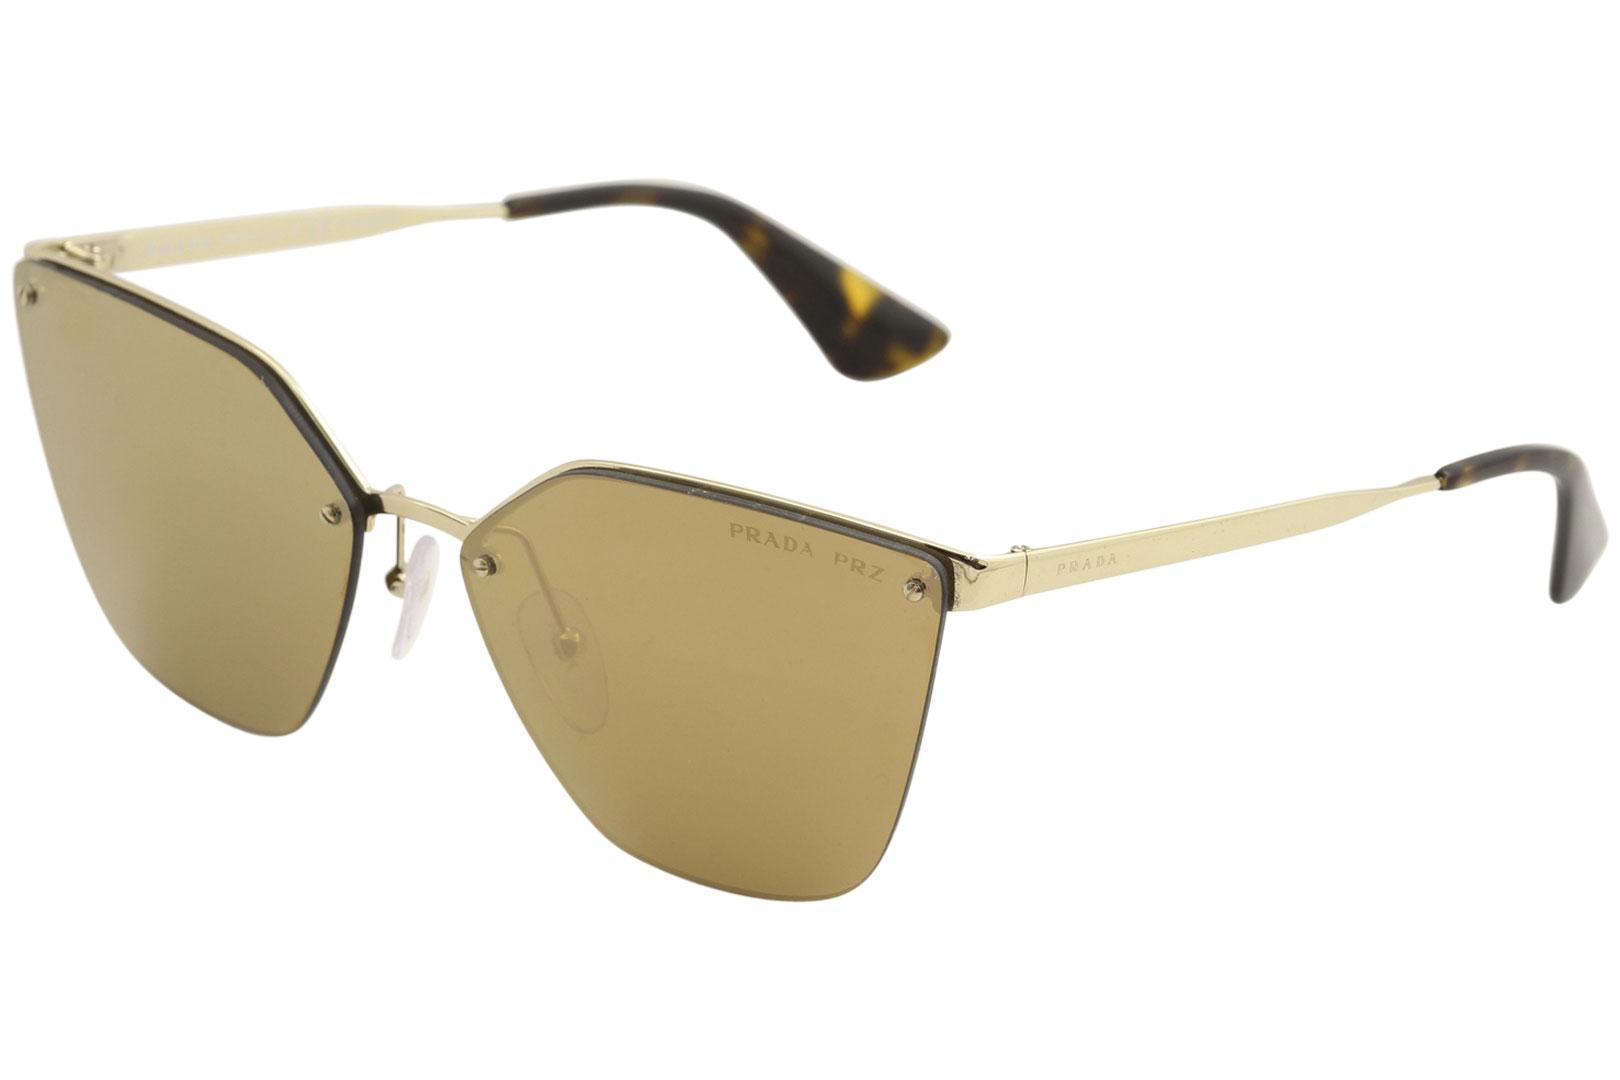 c90c0d3609 Prada SPR68T SPR 68 T ZVN 5N2 Pale Gold Cat Eye Polarized Sunglasses ...